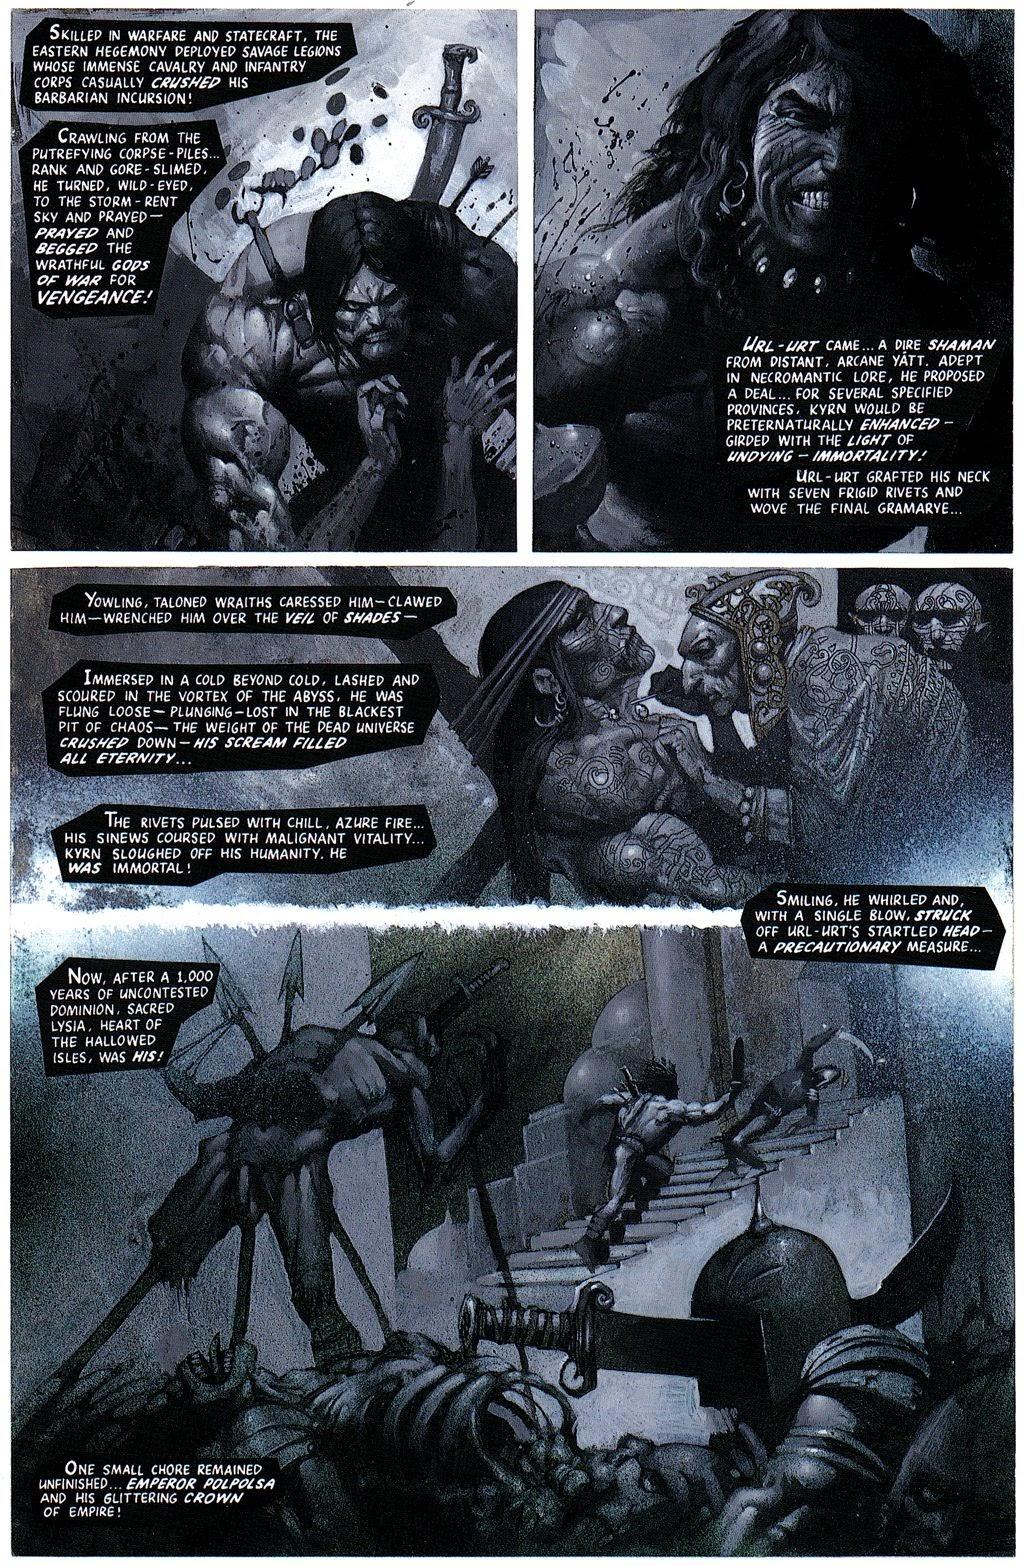 Read online Bisley's Scrapbook comic -  Issue # Full - 23